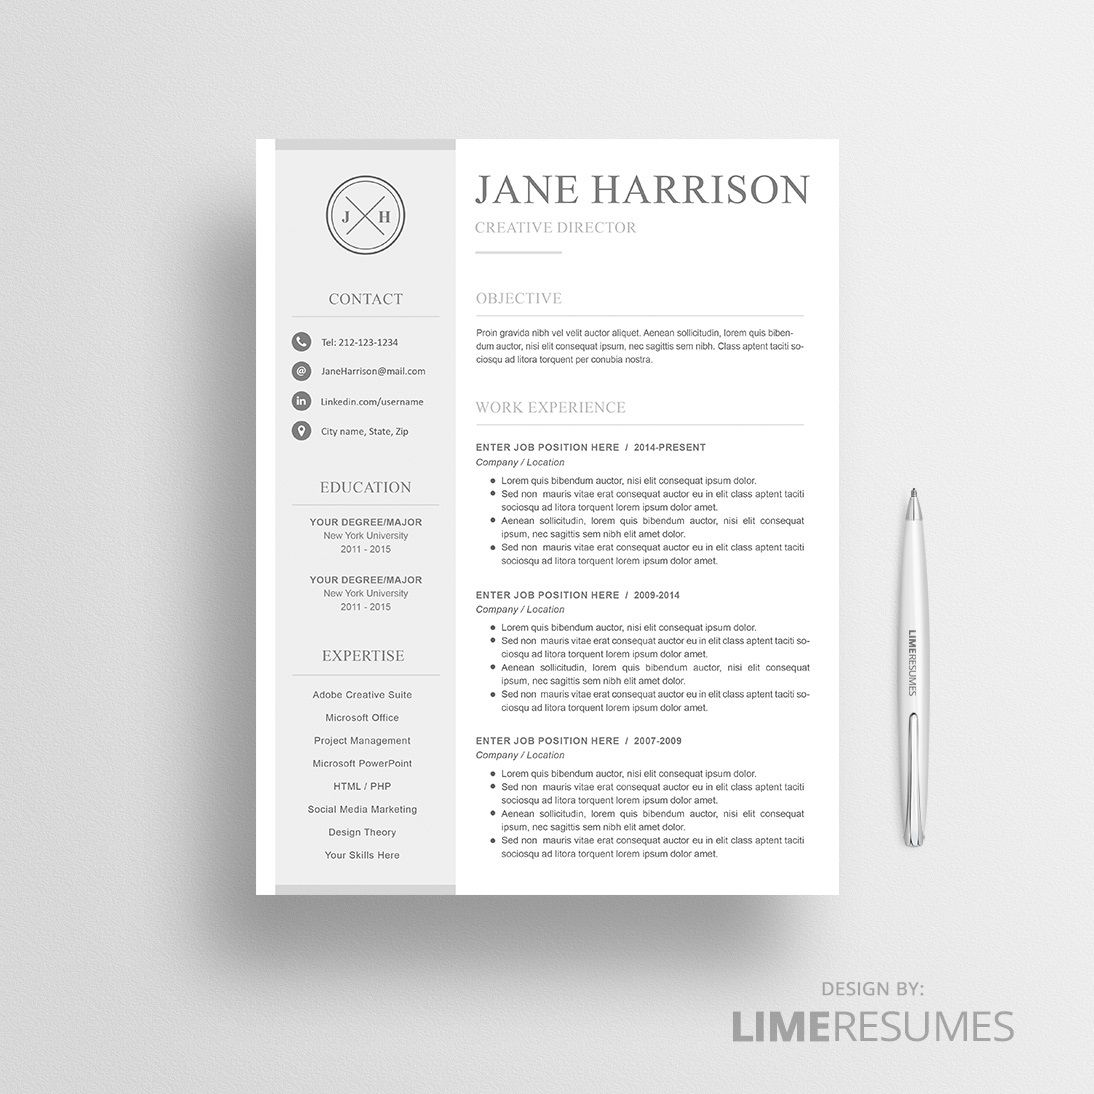 007 Phenomenal Resume Reference Template Microsoft Word Image  ListFull